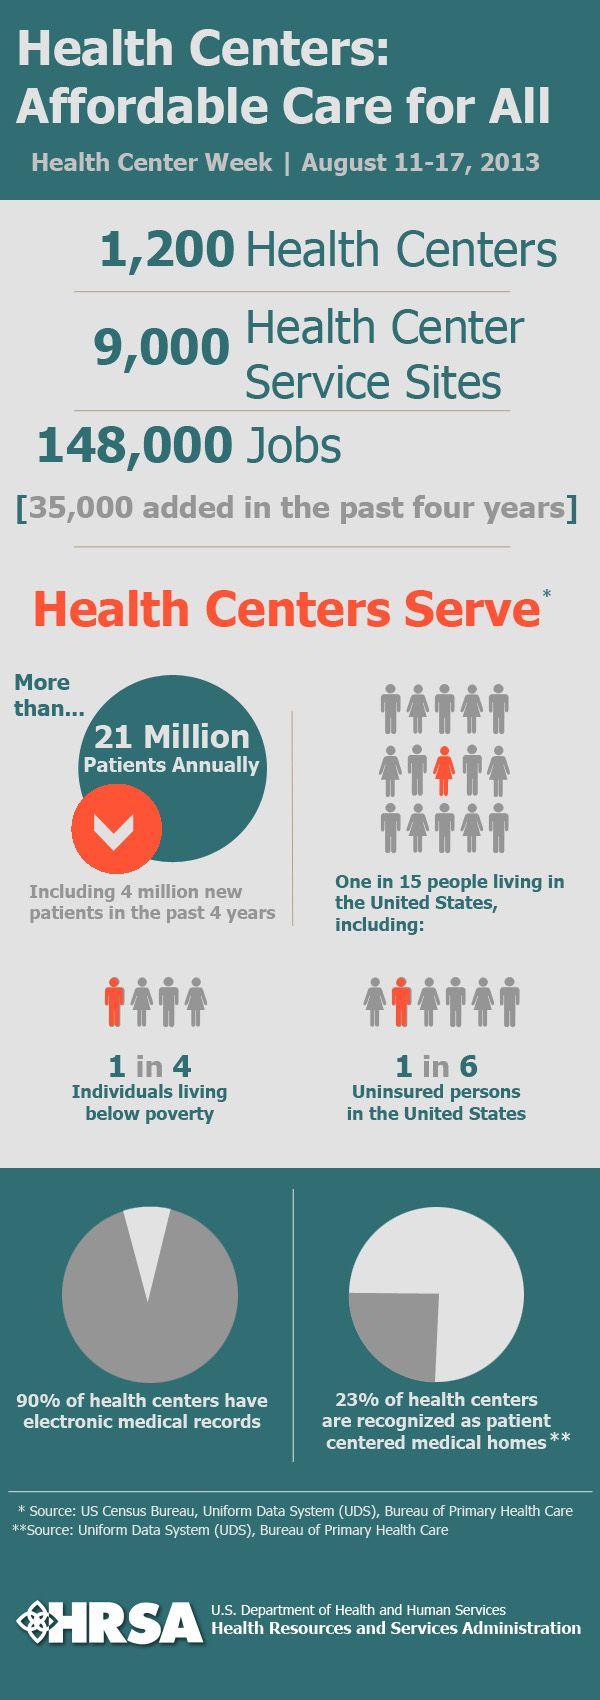 National #HealthCenter Week is August 11-17, 2013! #NHCW2013 #DisabilityNinjas